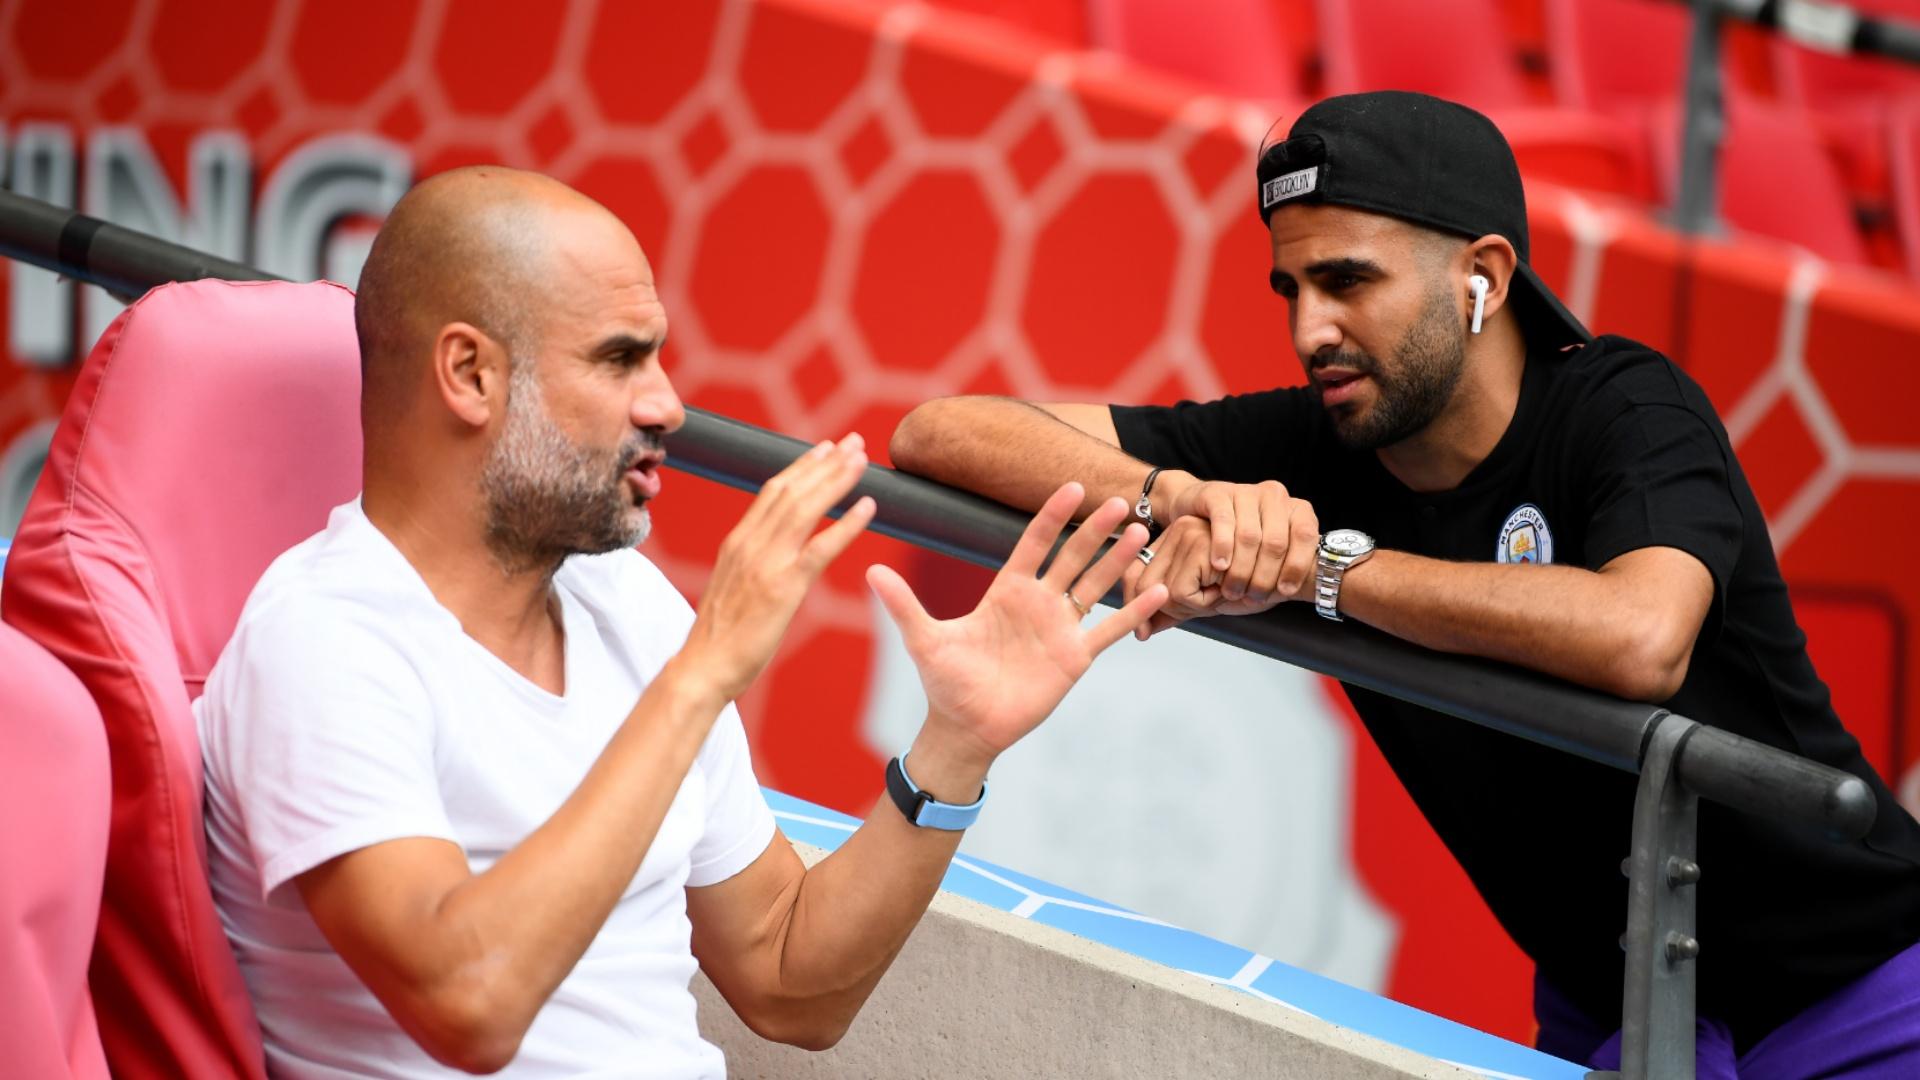 Bayern 'going very well' under Flick amid Guardiola talk, says Neuer